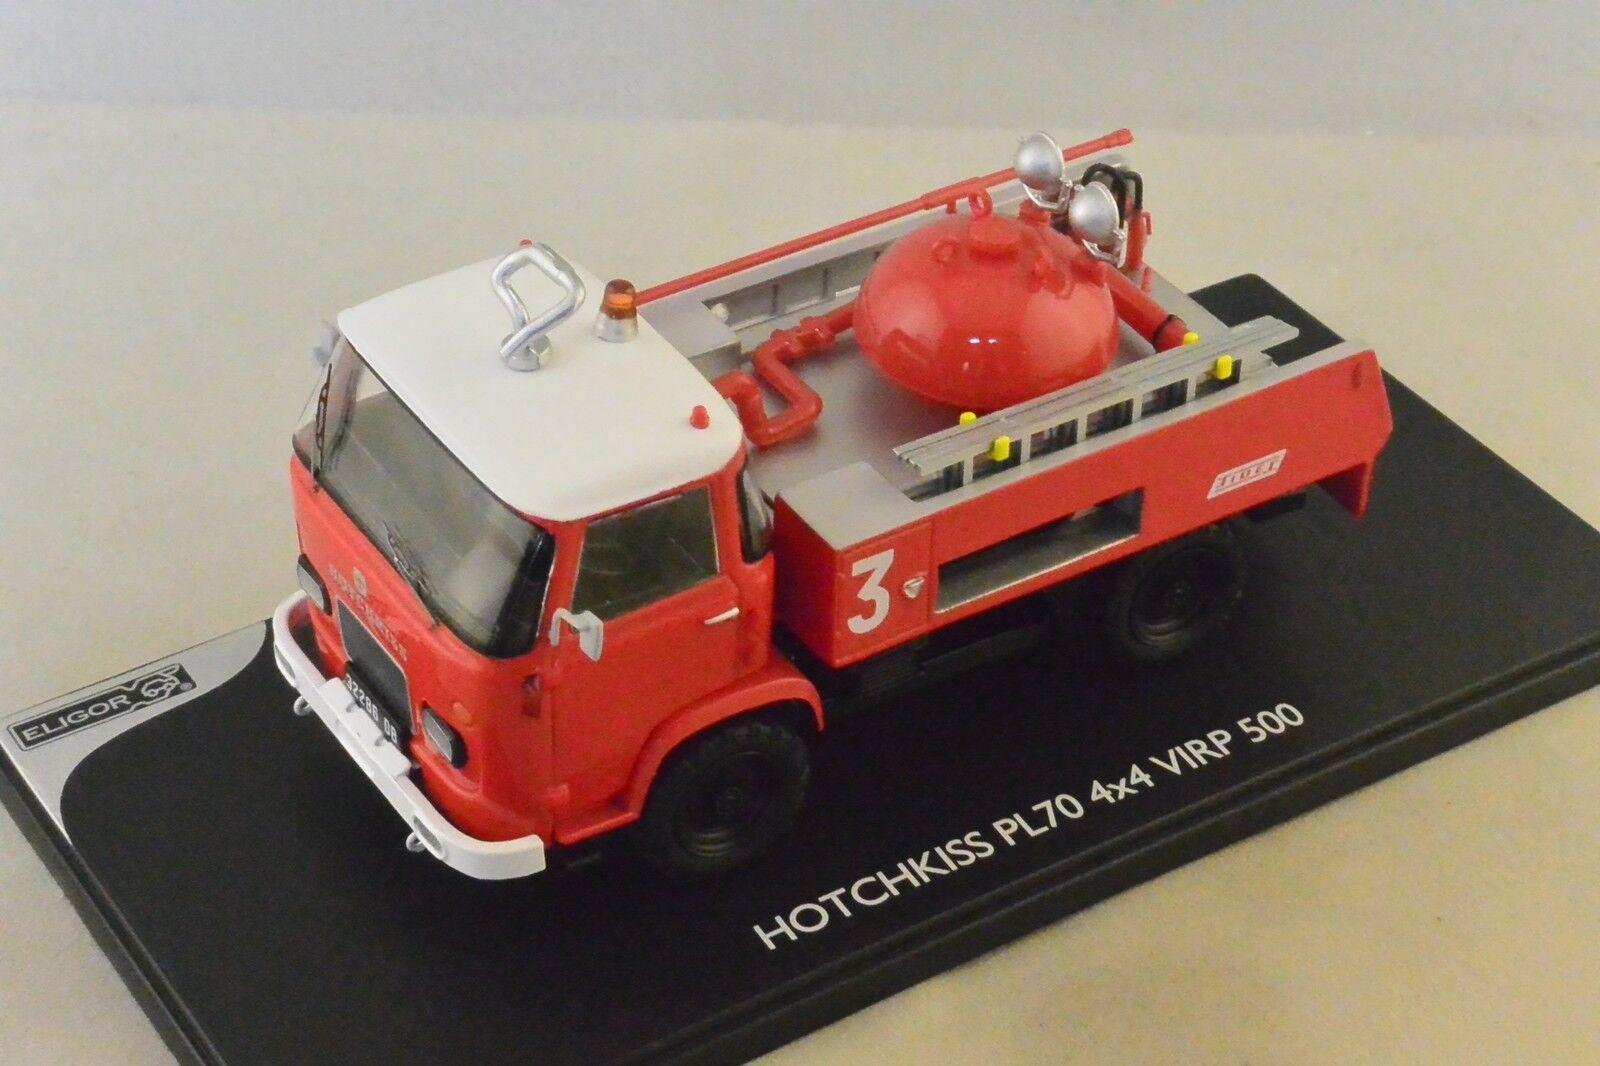 Eligor 101535 hodgkiss pl70 4x4 virp 500 pompiers 1   43